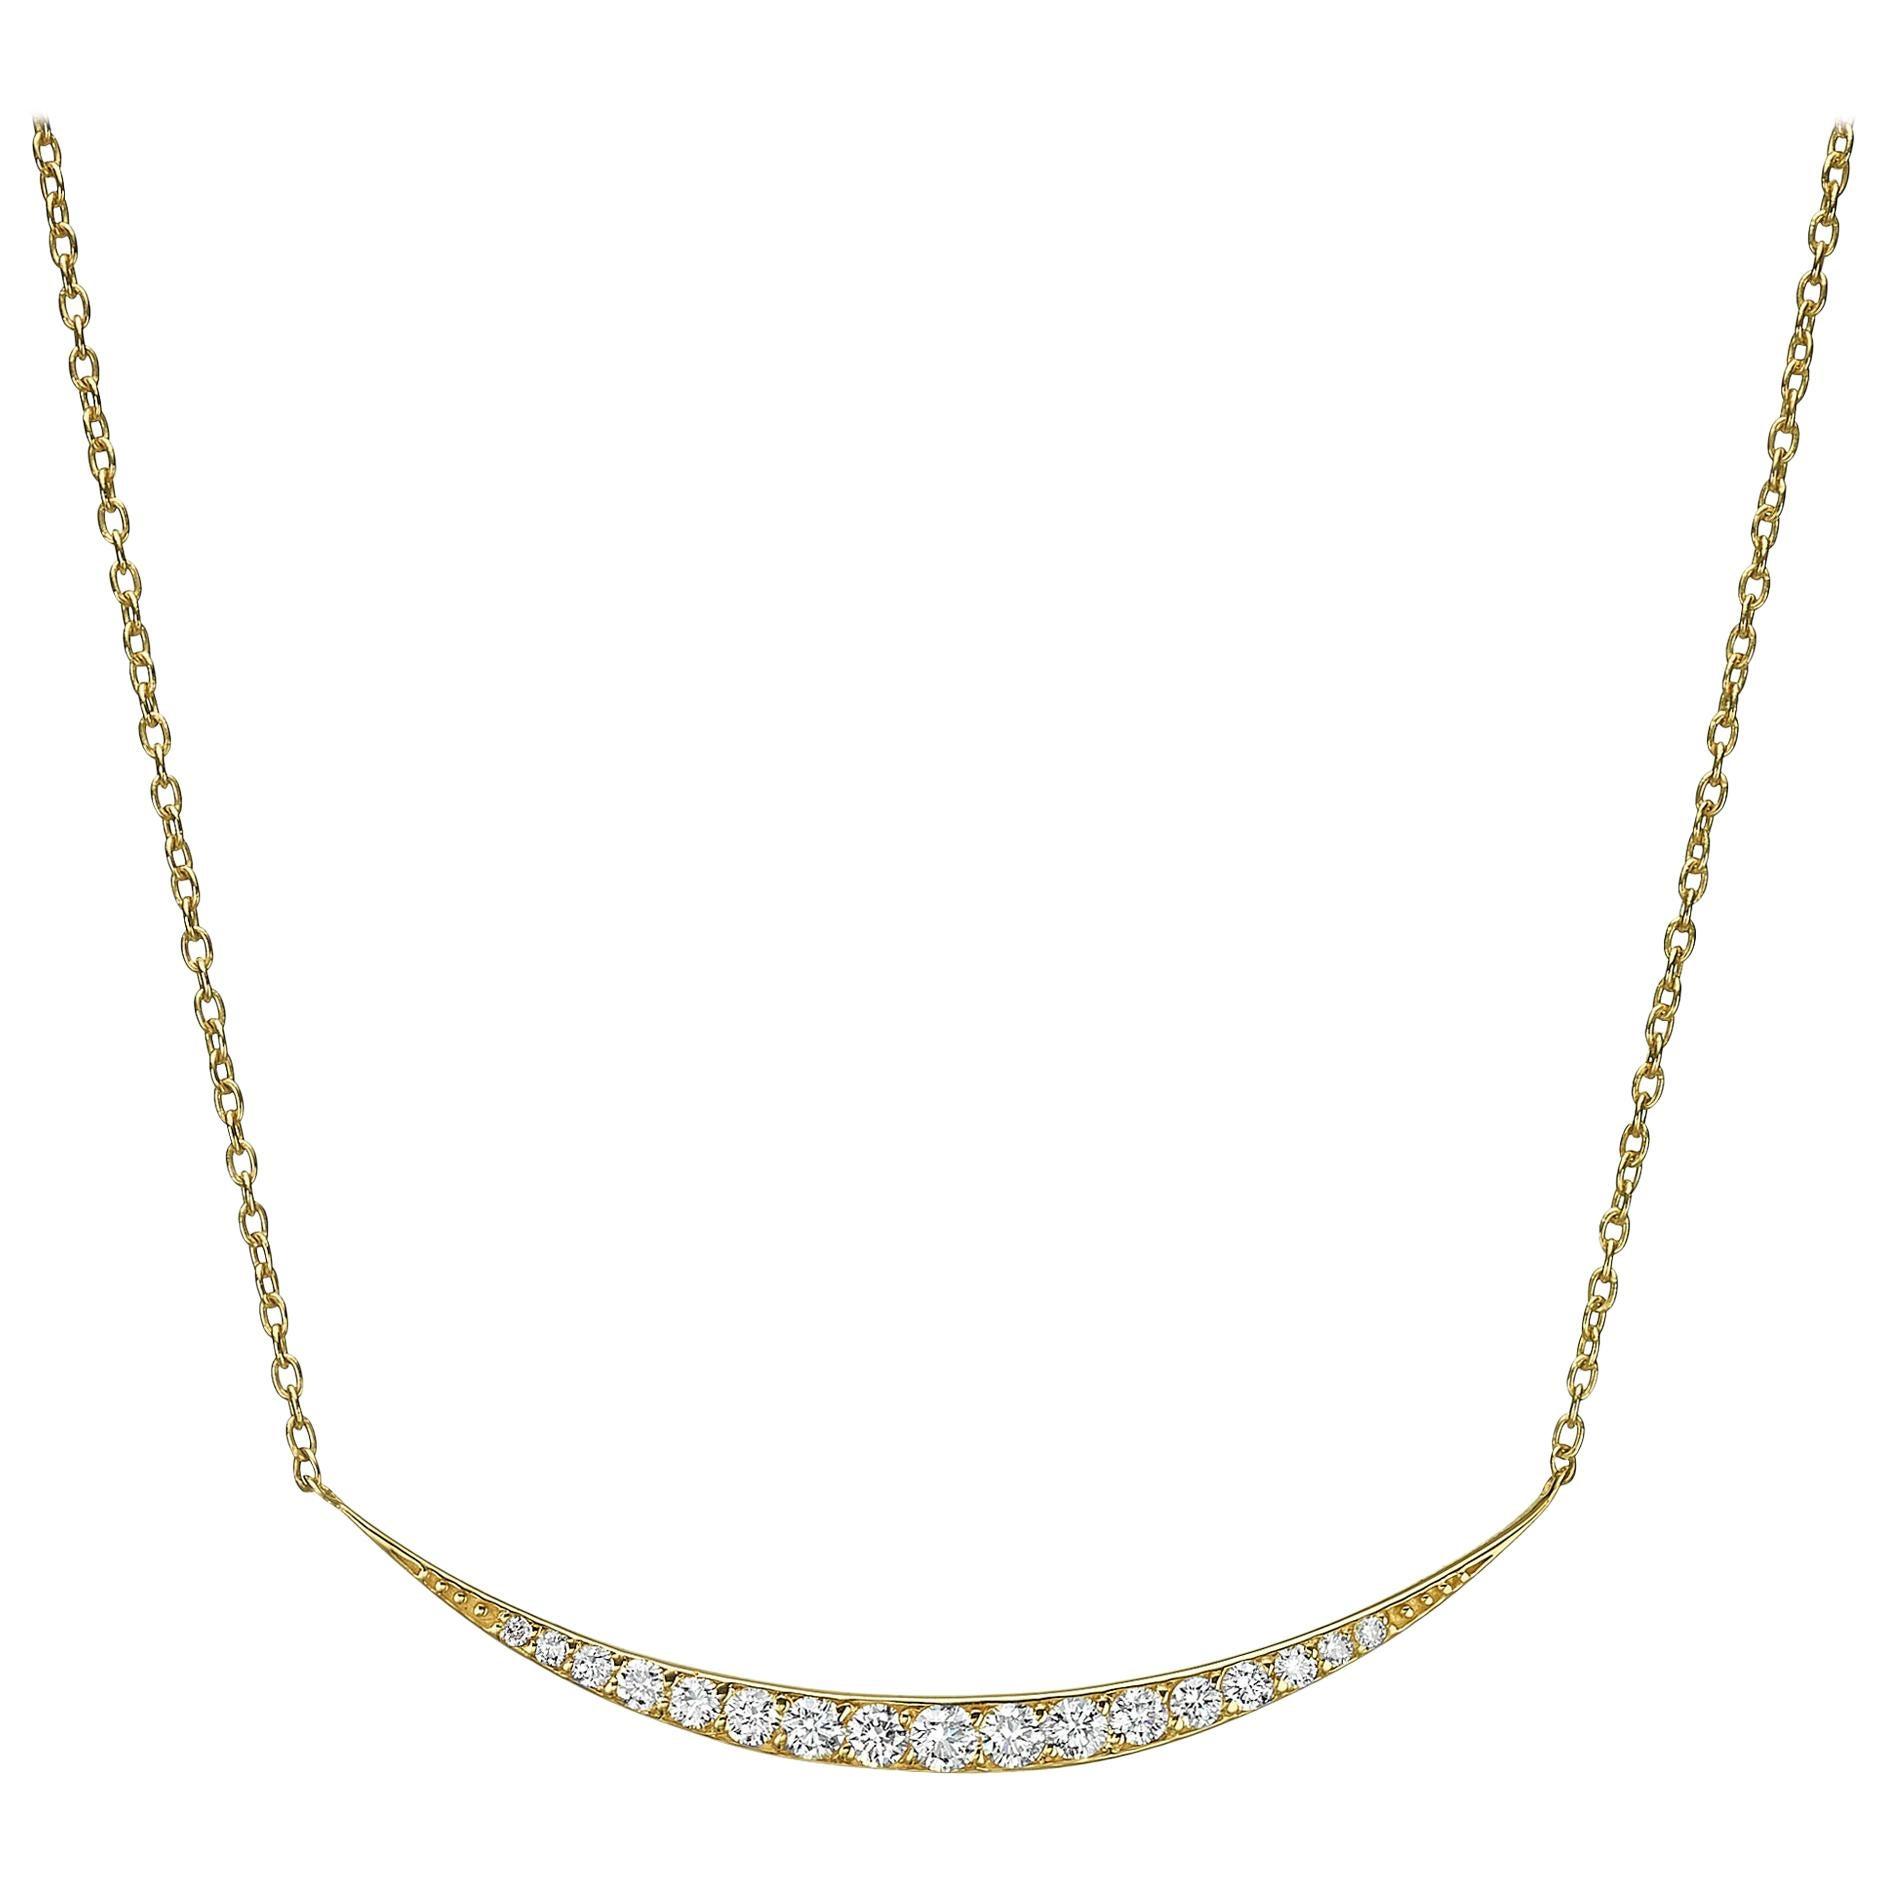 18 Karat Gold, 0.40 Carat, F Color, VS Clarity, Crescent Diamond Crusted Pendant